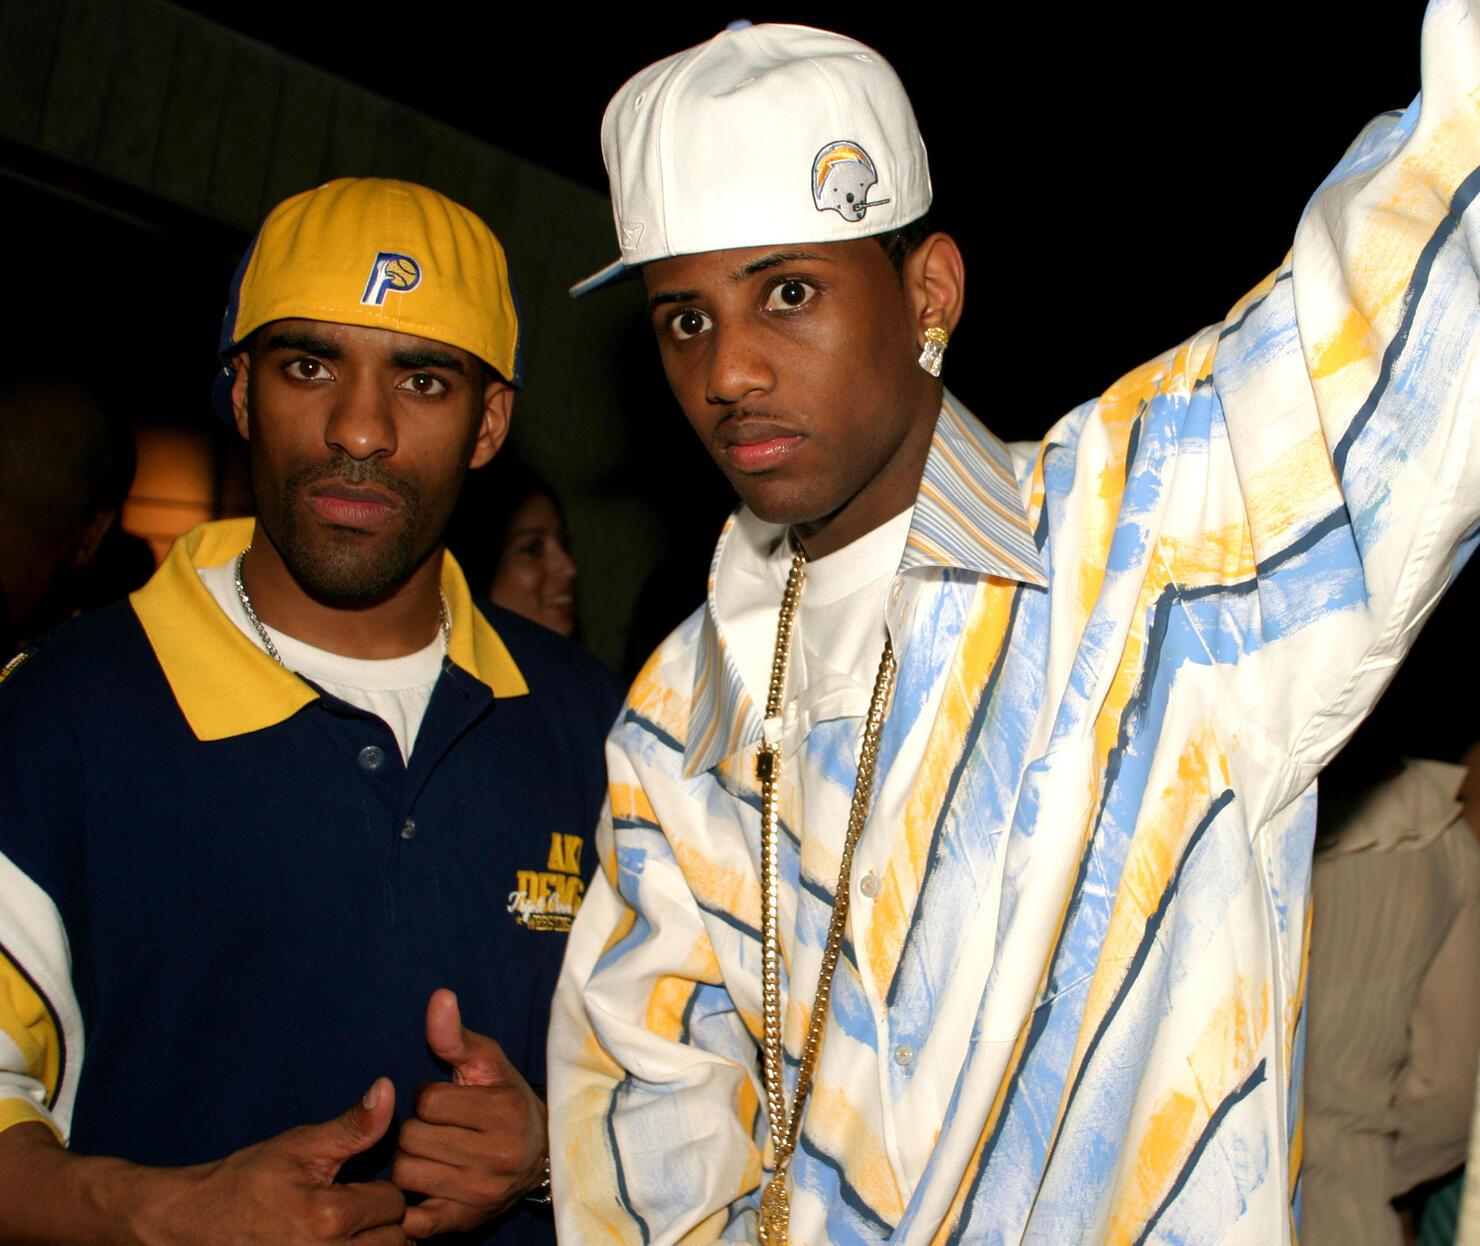 Young DJ Clue and Fabolous Photo